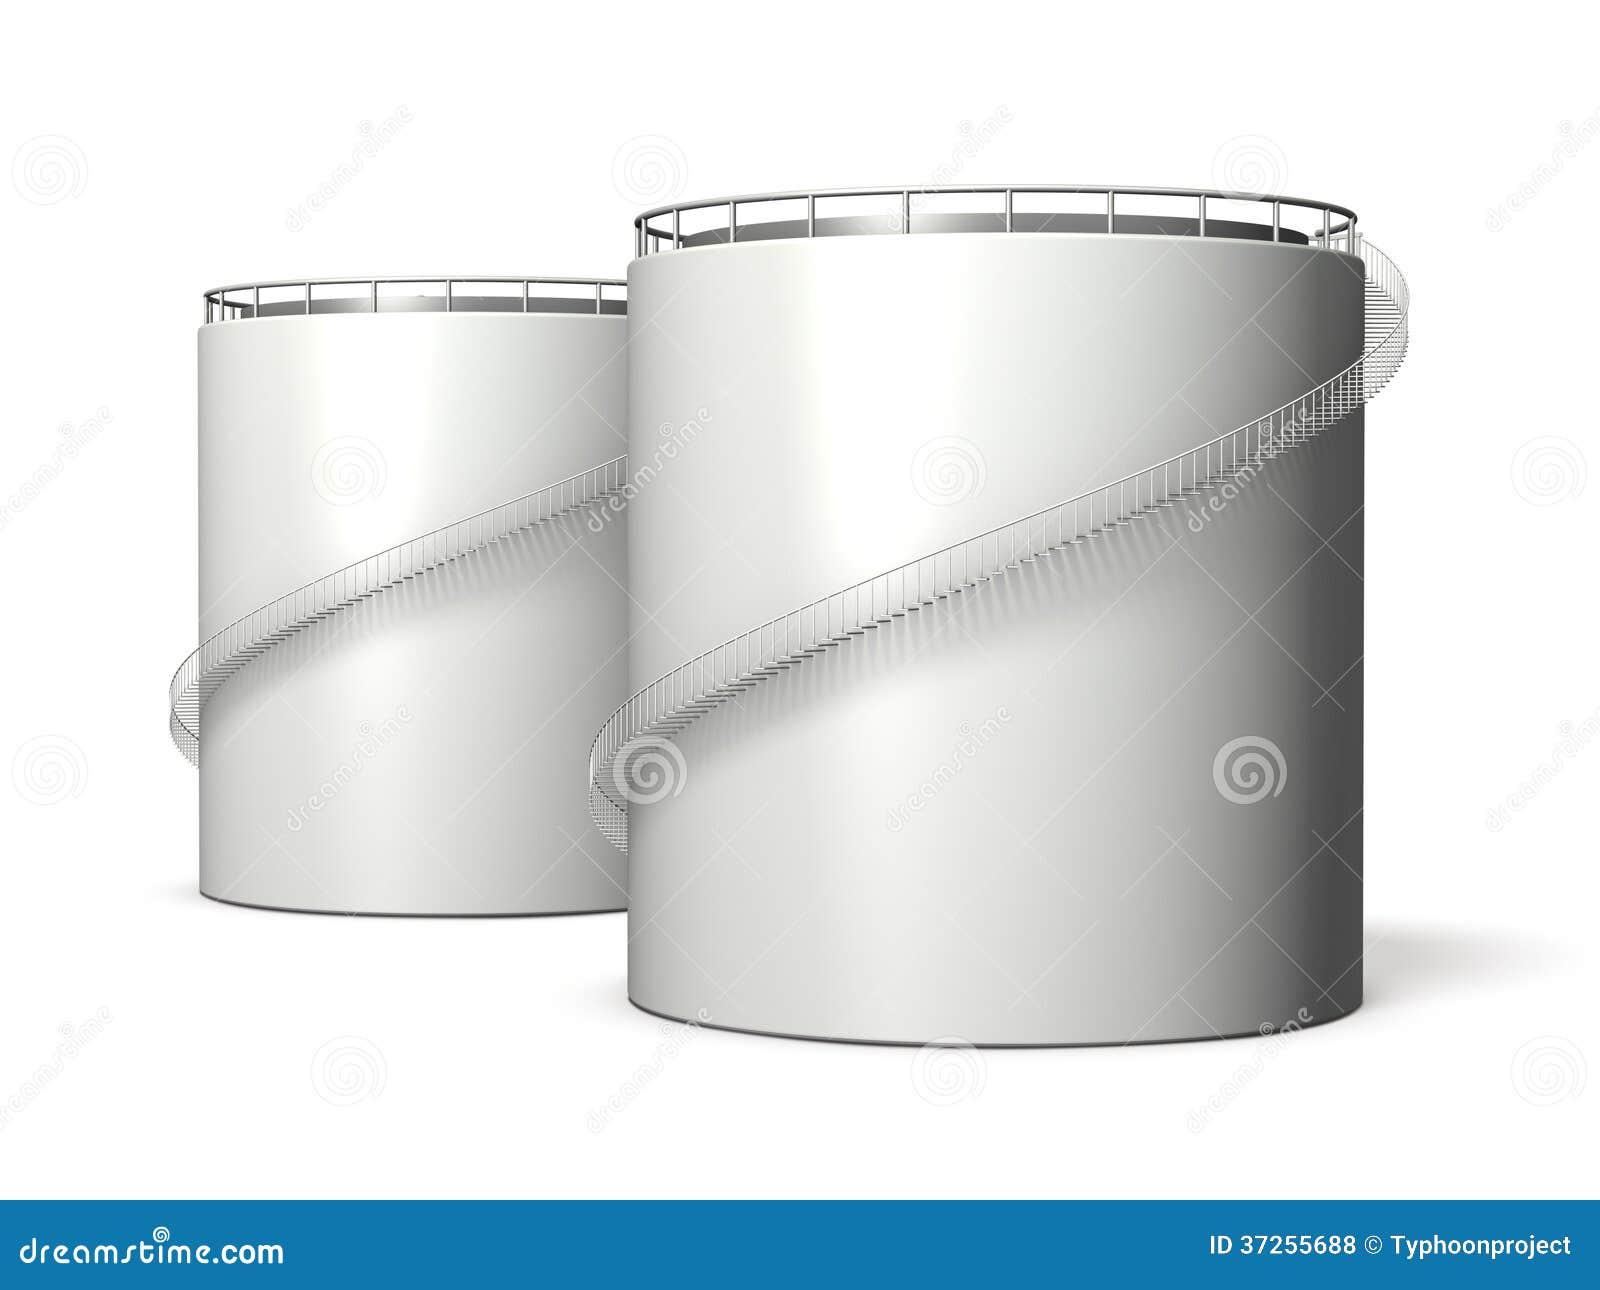 miniature model of oil tank royalty free stock photos